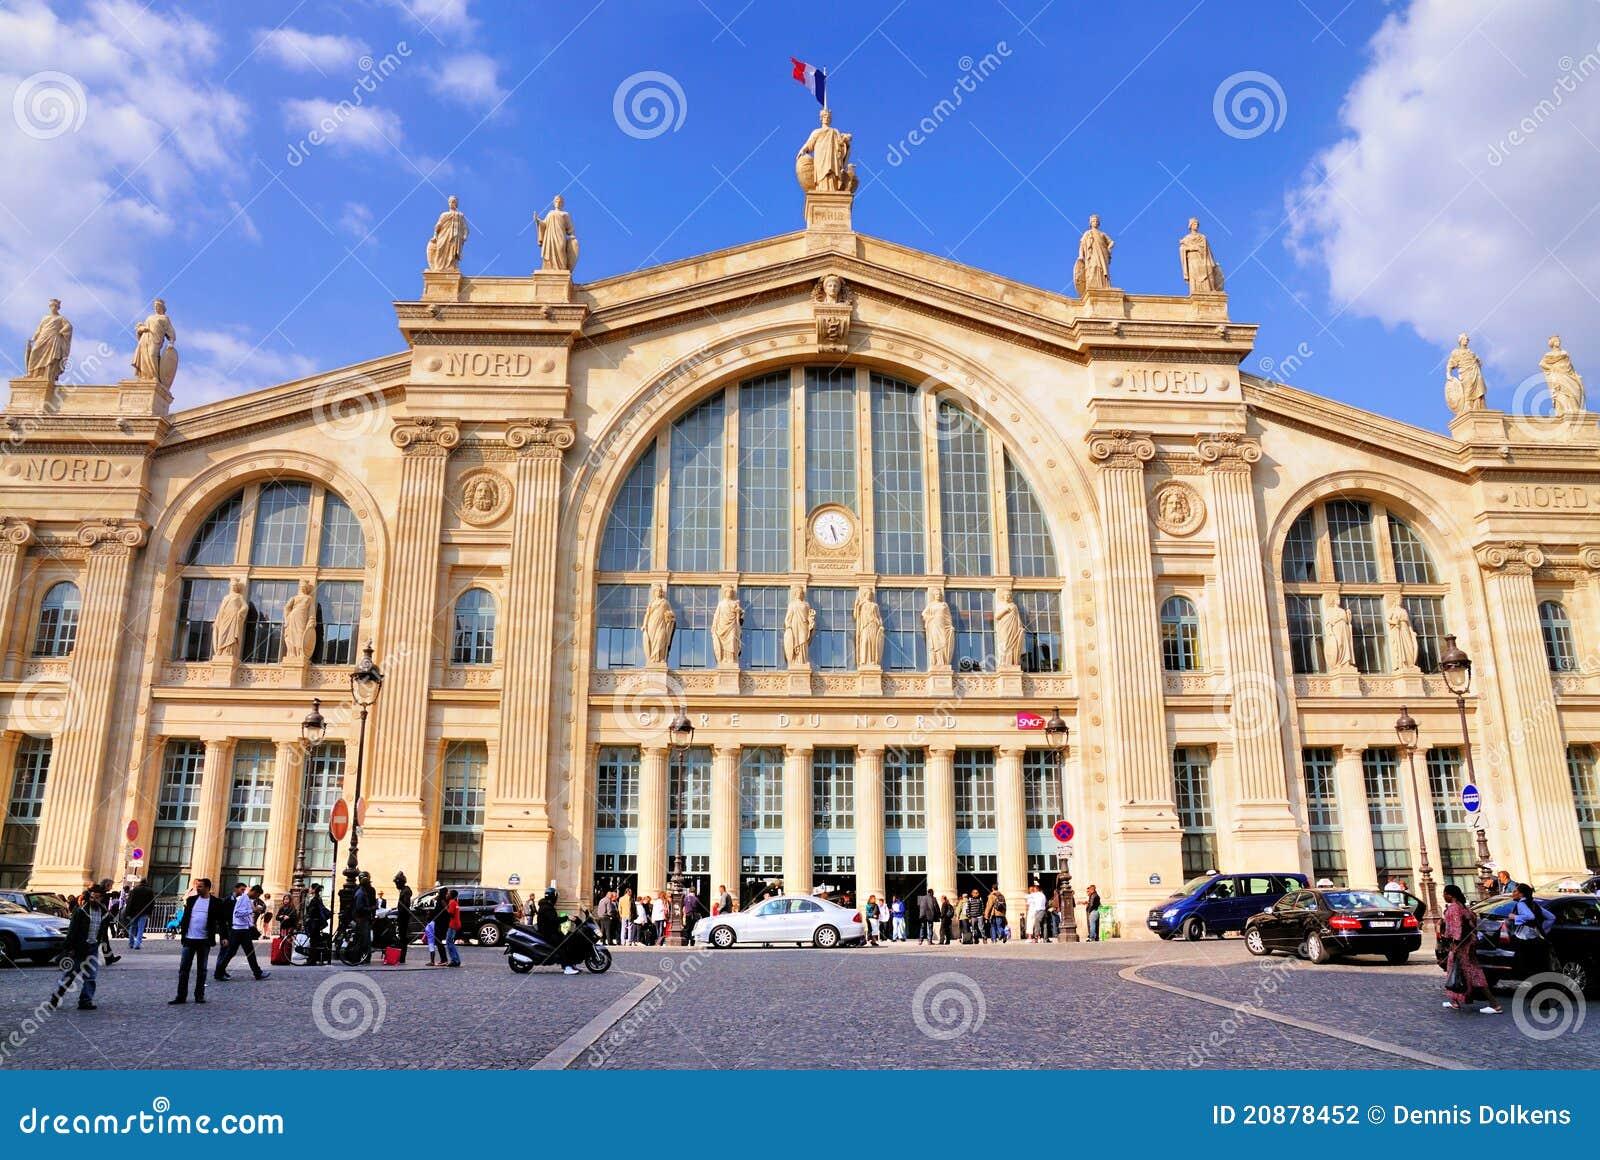 Gare du nord paris editorial photography image 20878452 for Gare du nord paris